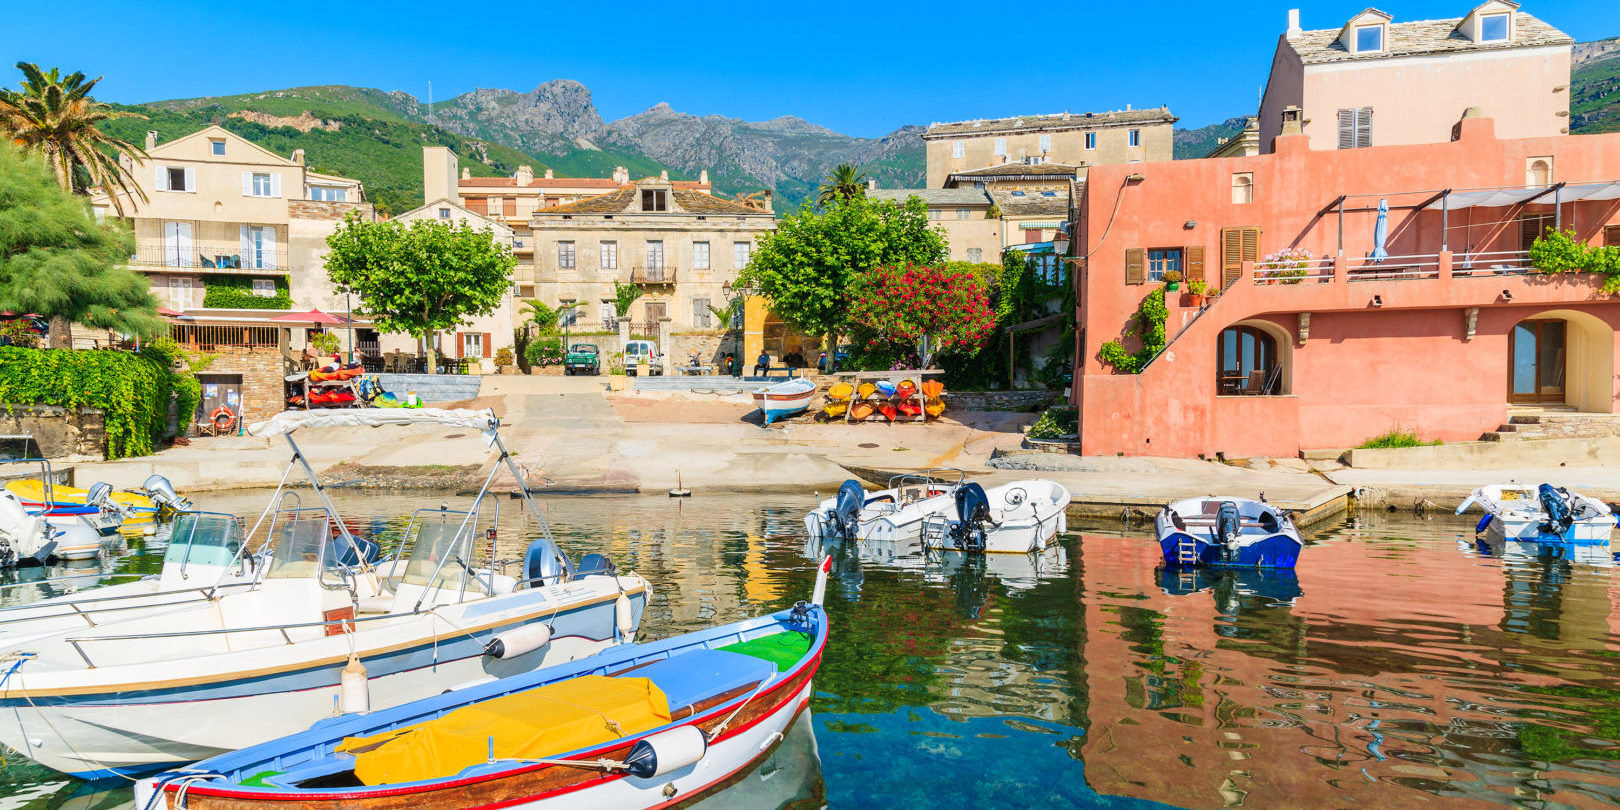 Erbalunga Cap-Corse Capicorsu Corsica Frankrijk haven vissersboten stadje huizen palmbomen kano's kleurrijk